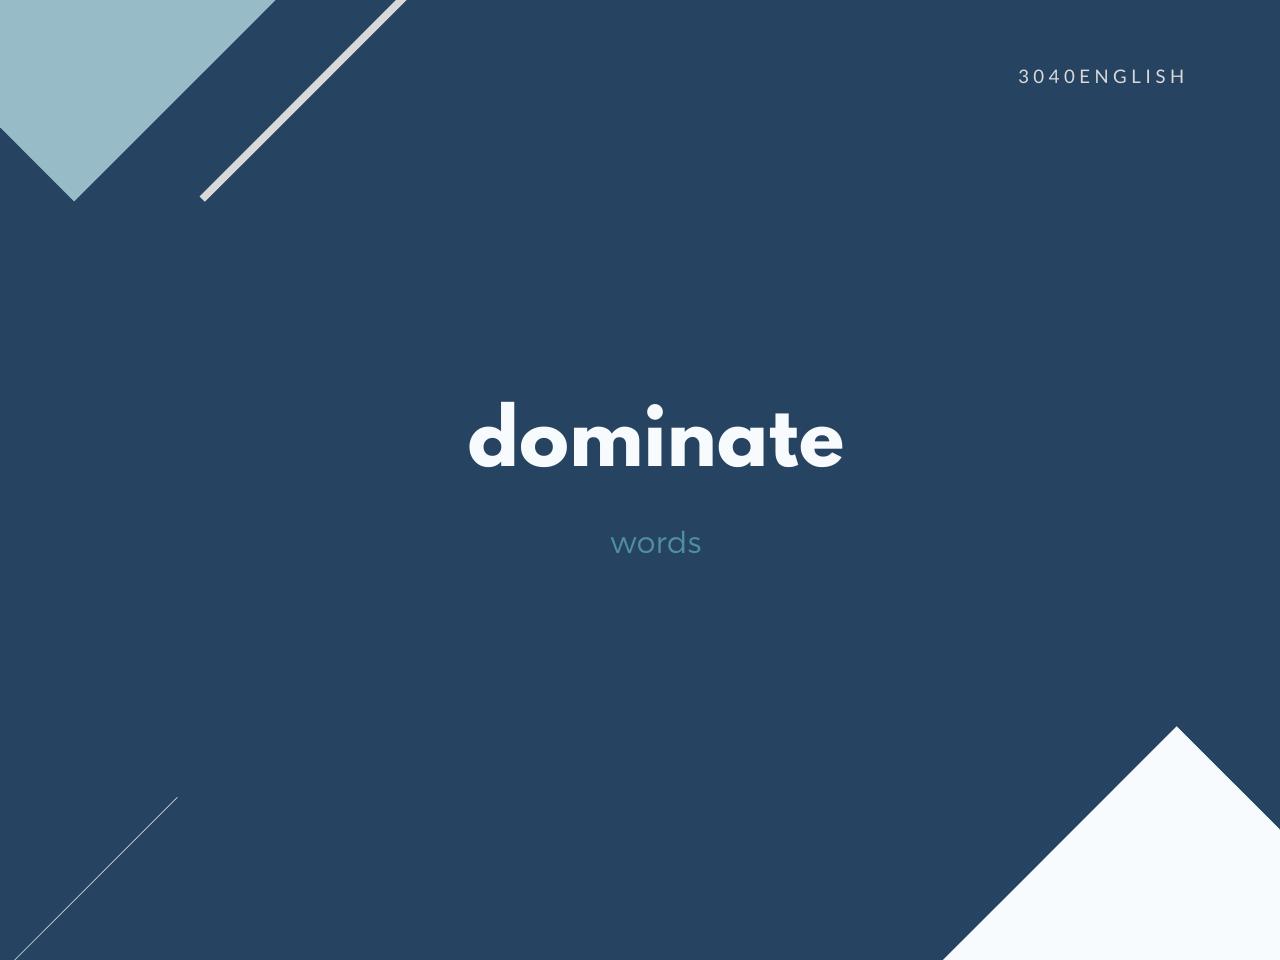 dominate の意味と簡単な使い方【音読用例文あり】